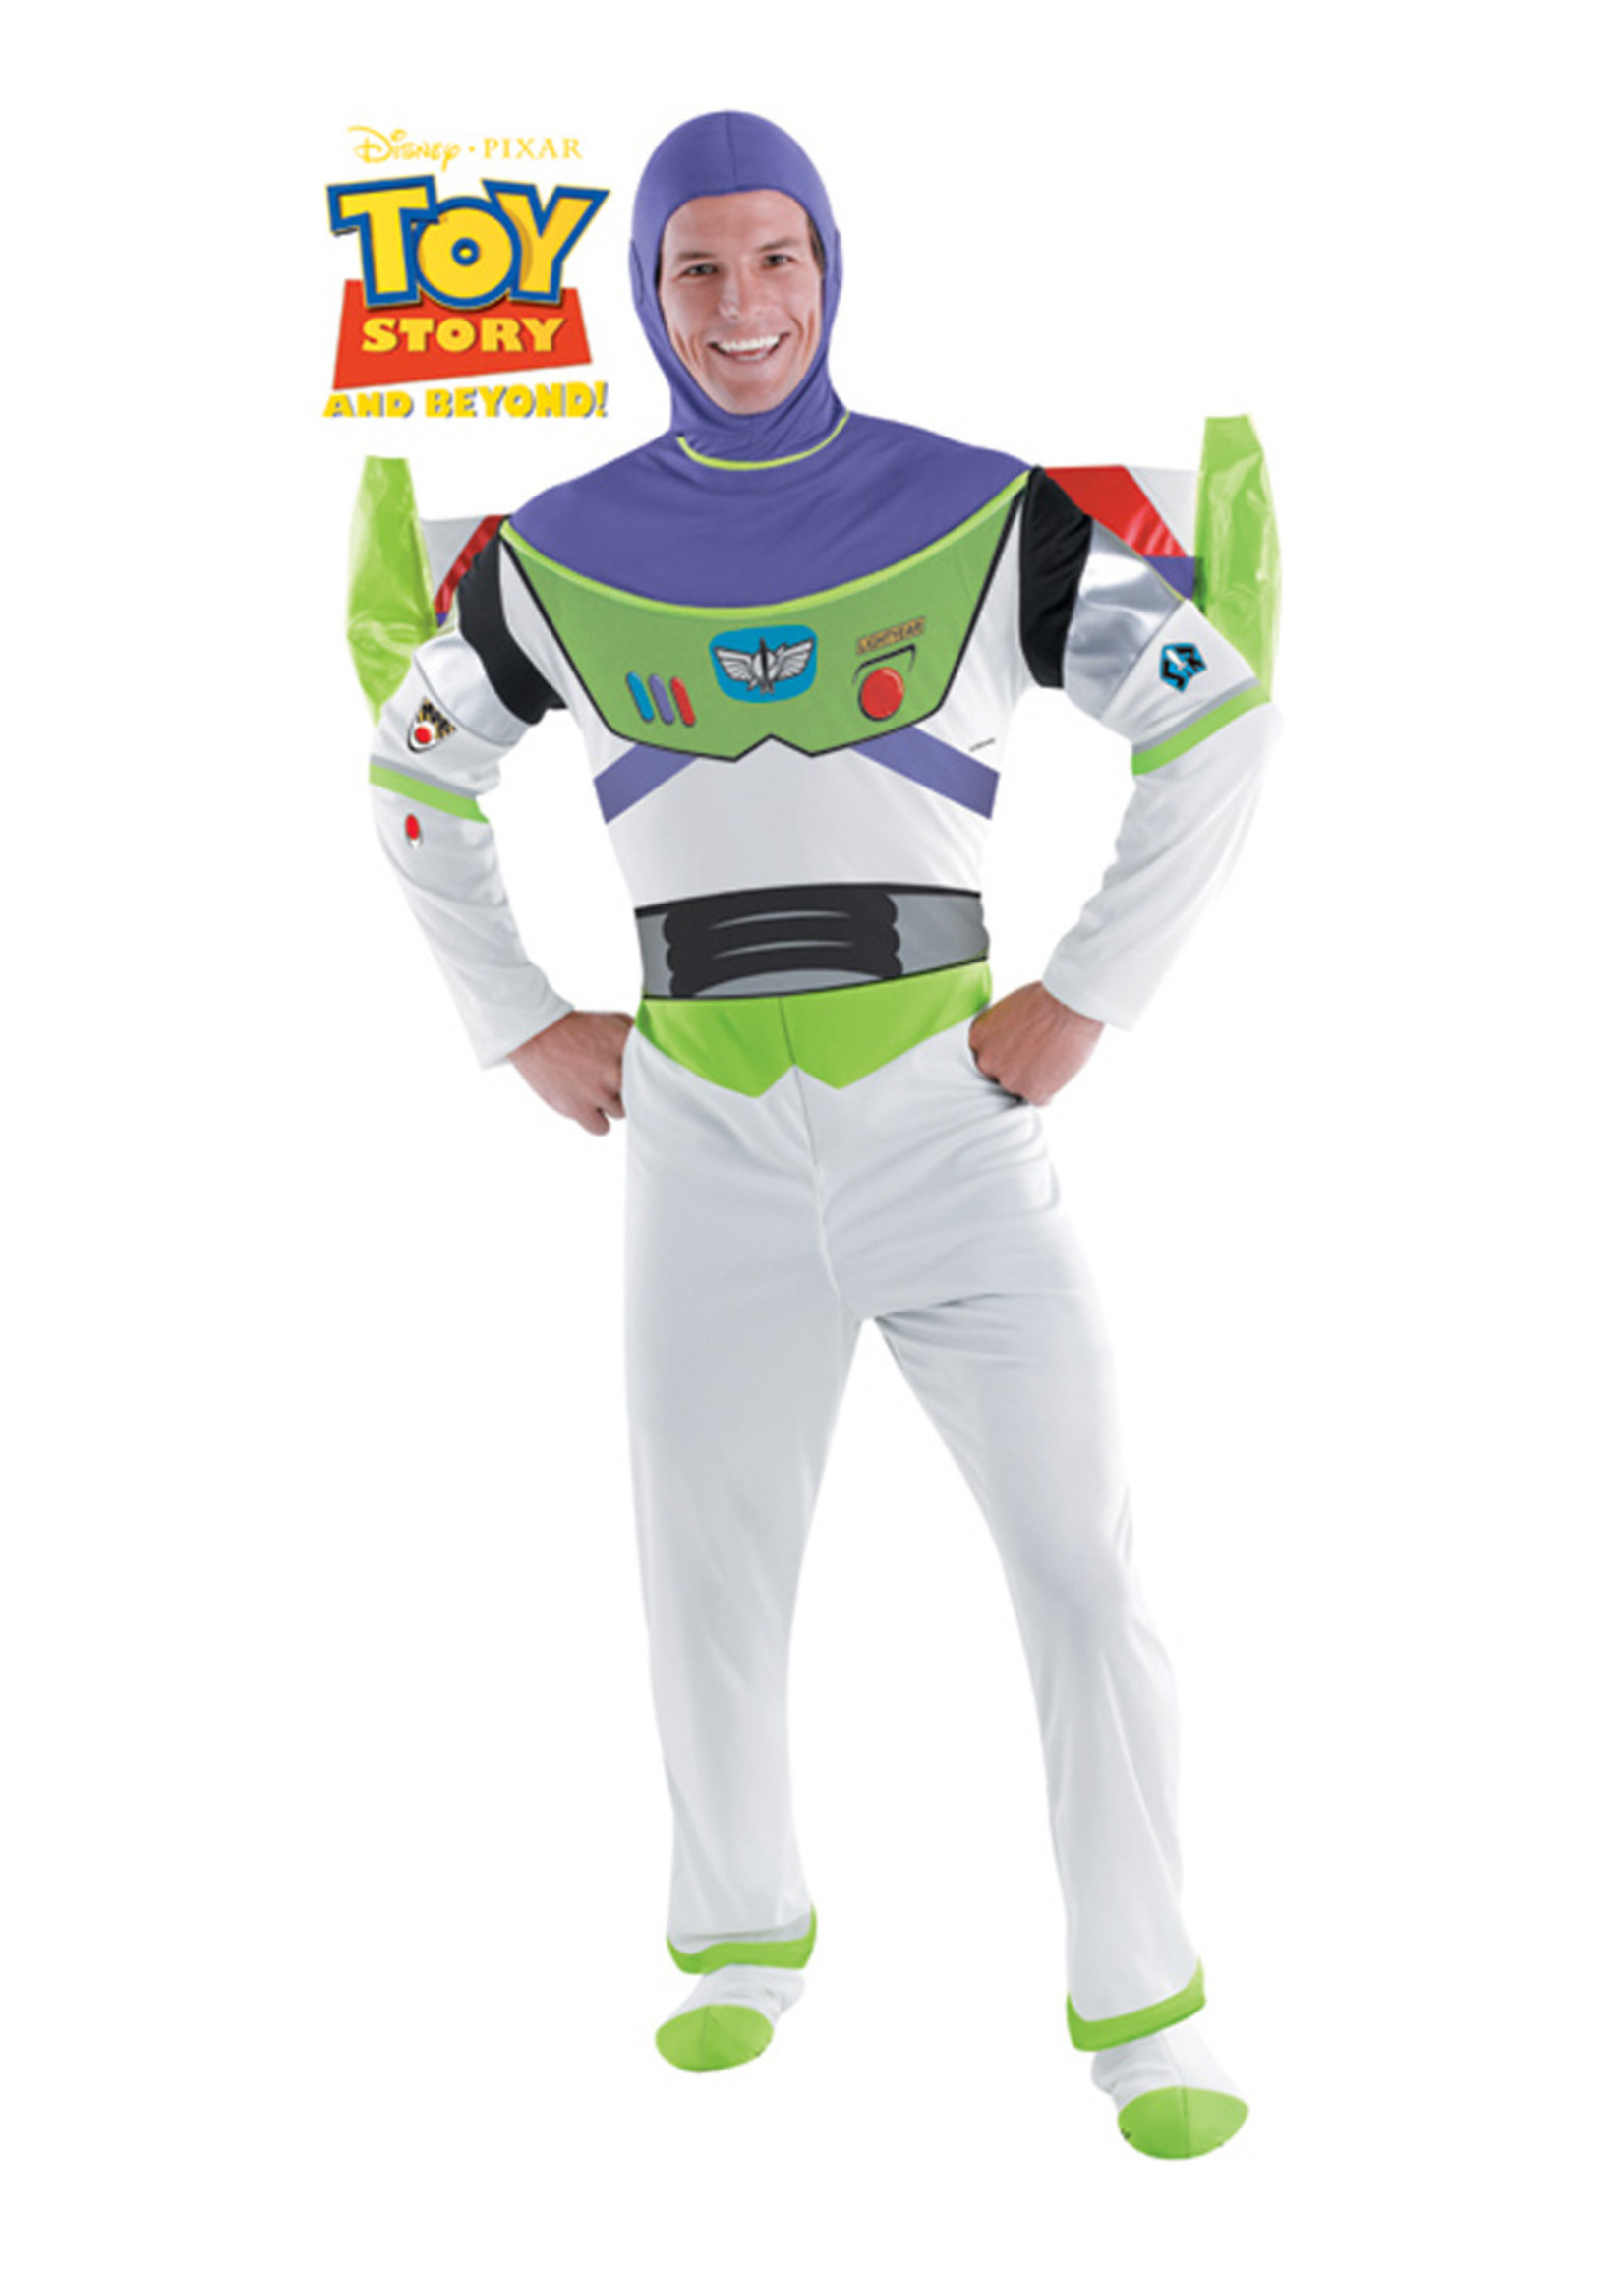 Buzz Lightyear Costume - Men's